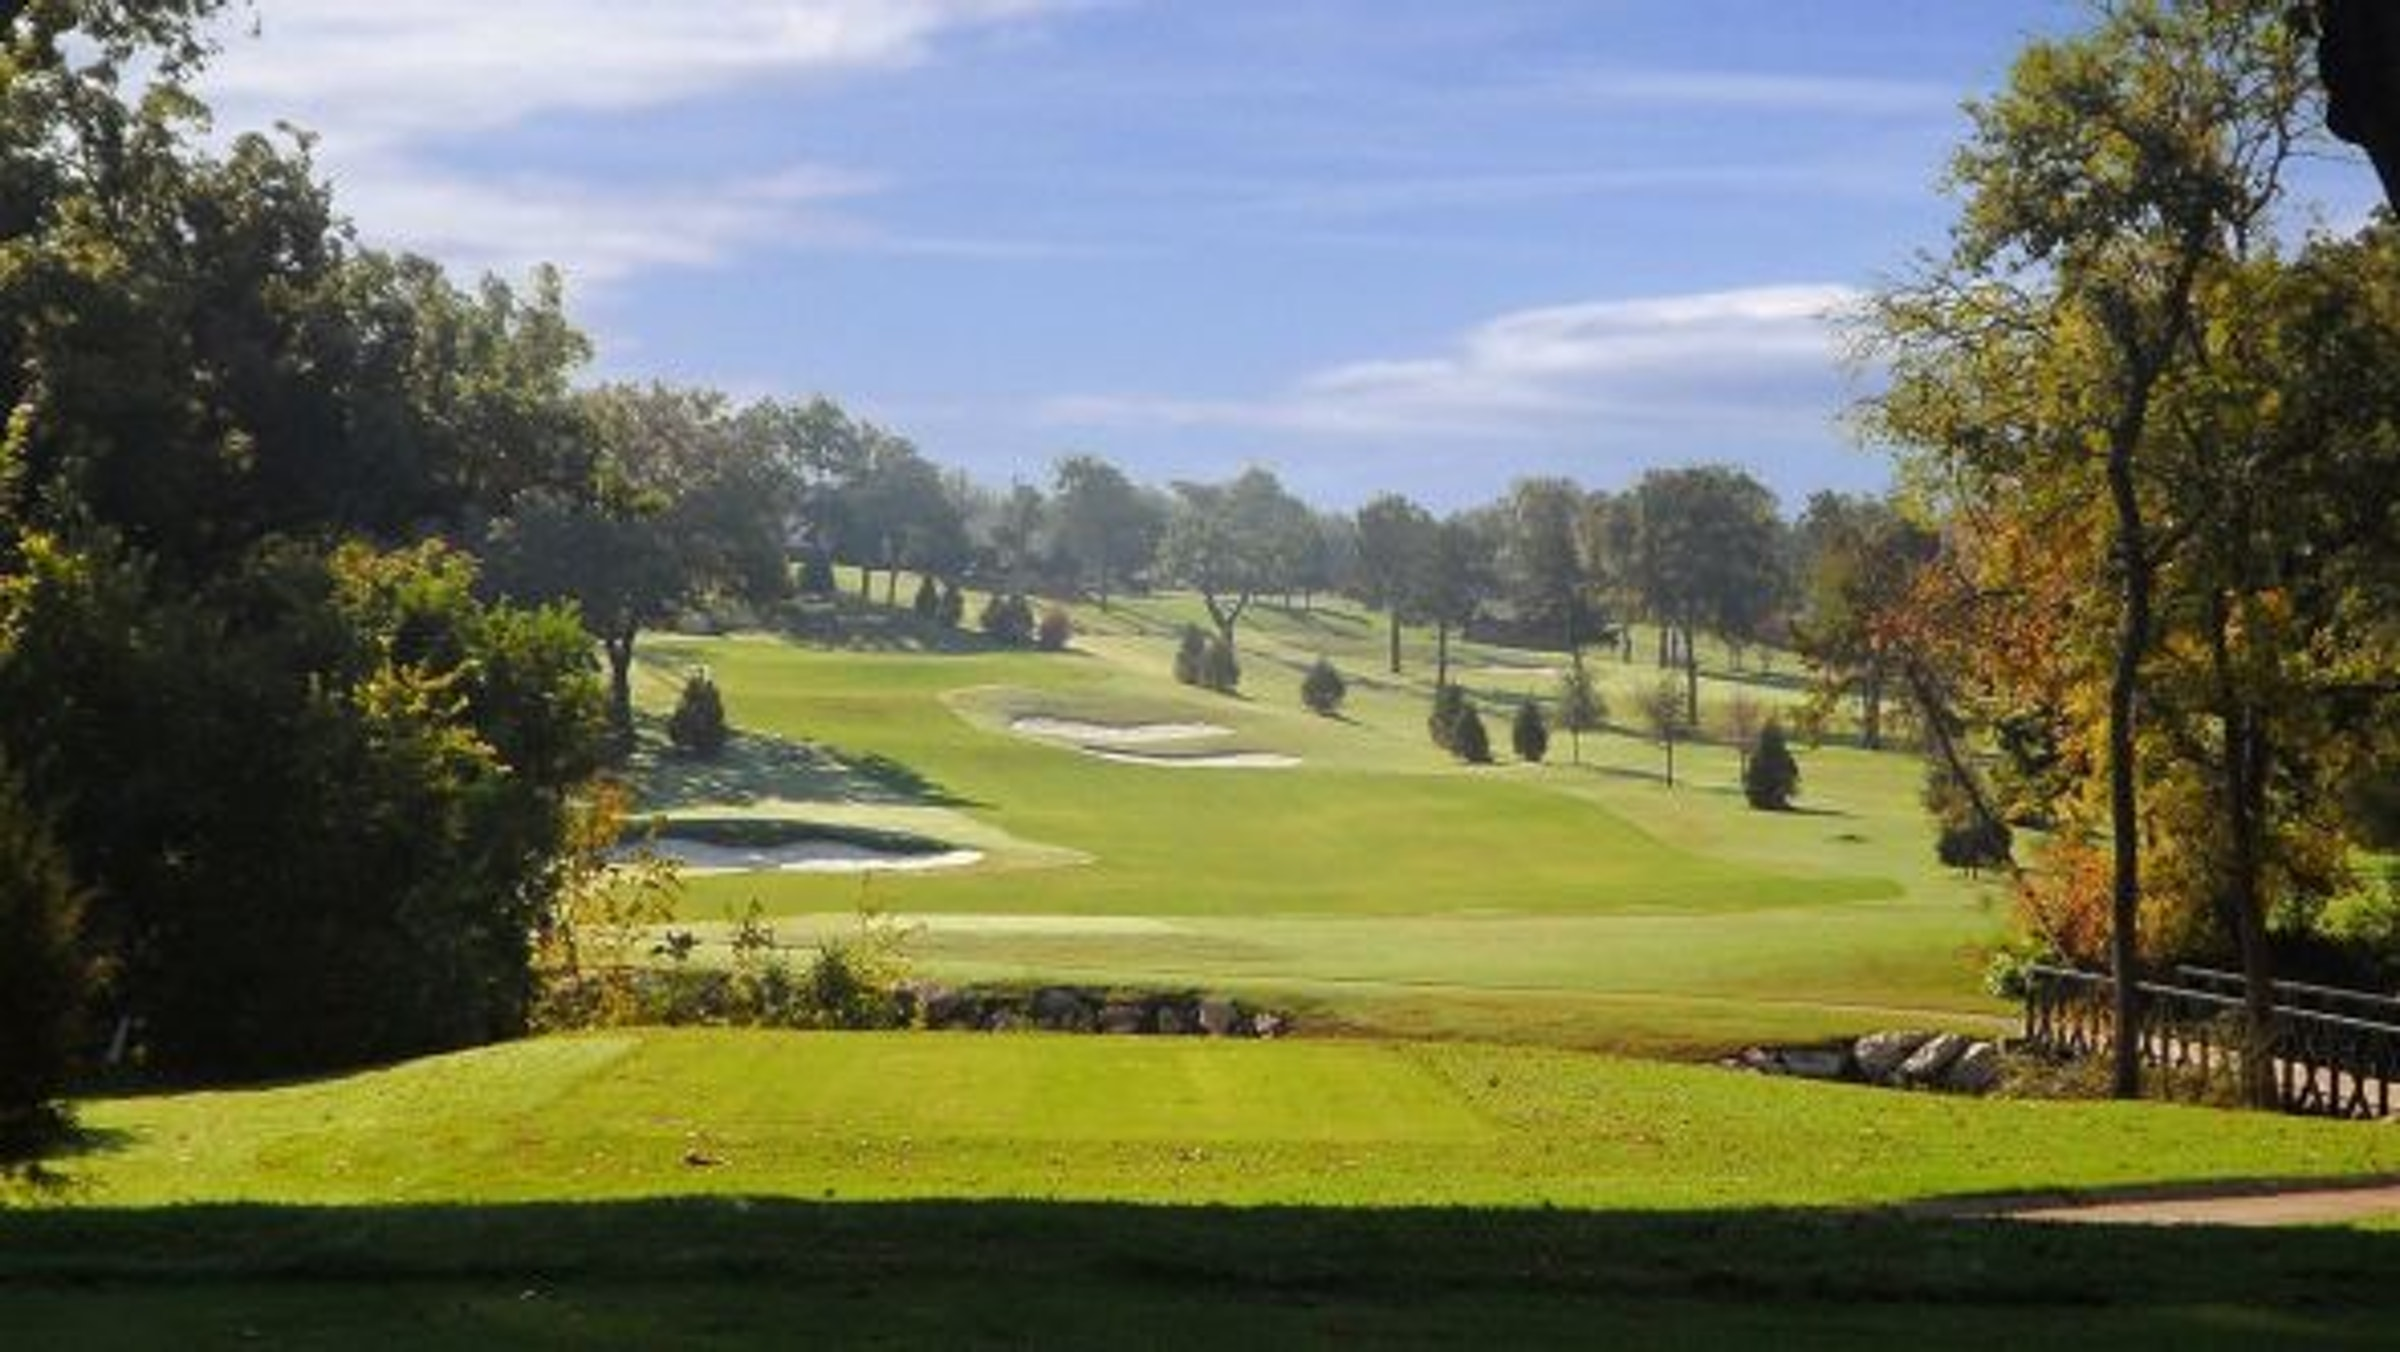 Keeton Park Golf Course in Beyond Dallas